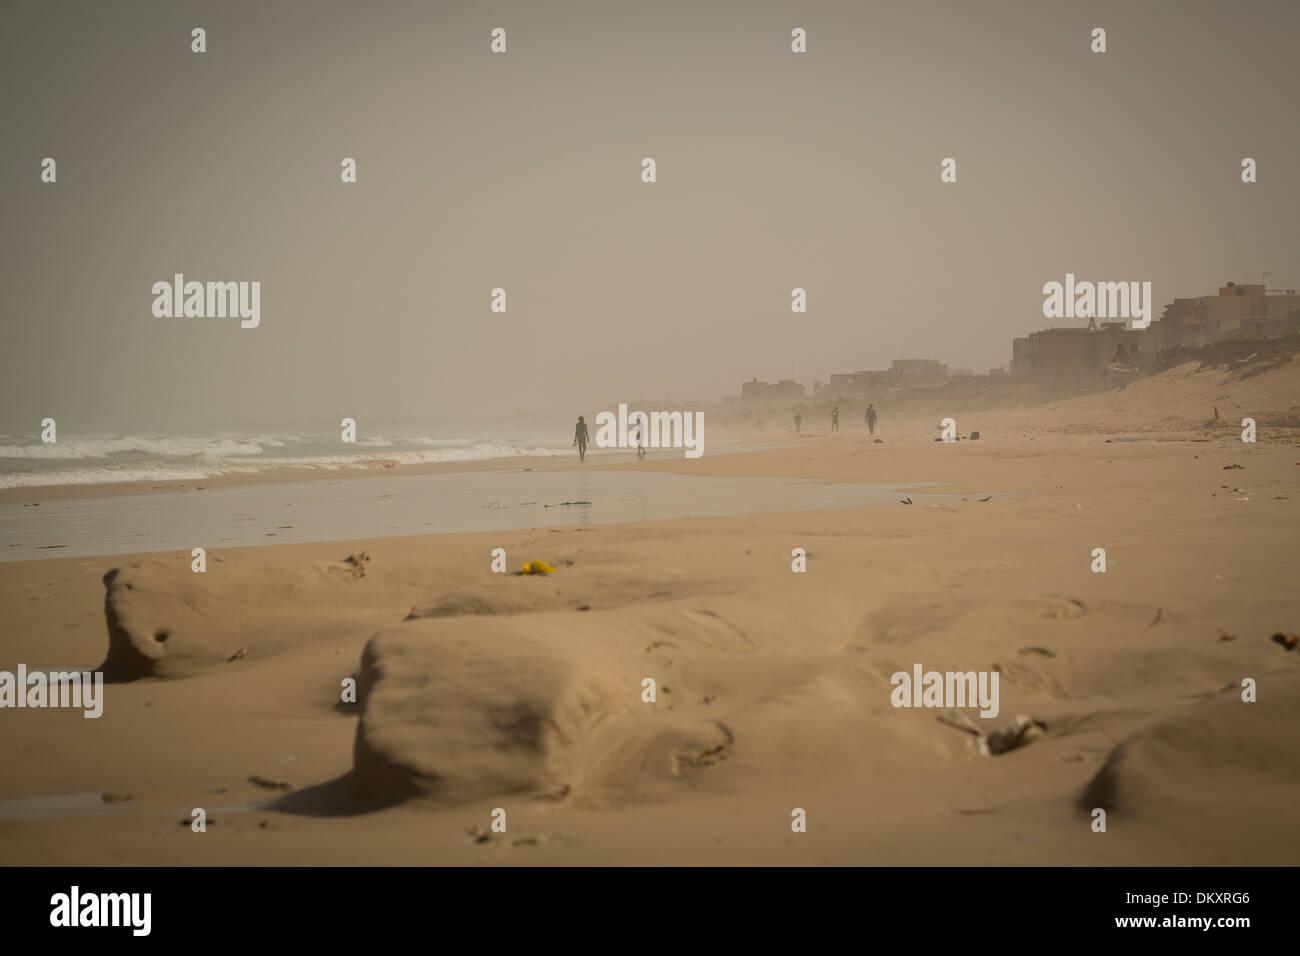 Dakar, Senegal Imagen De Stock